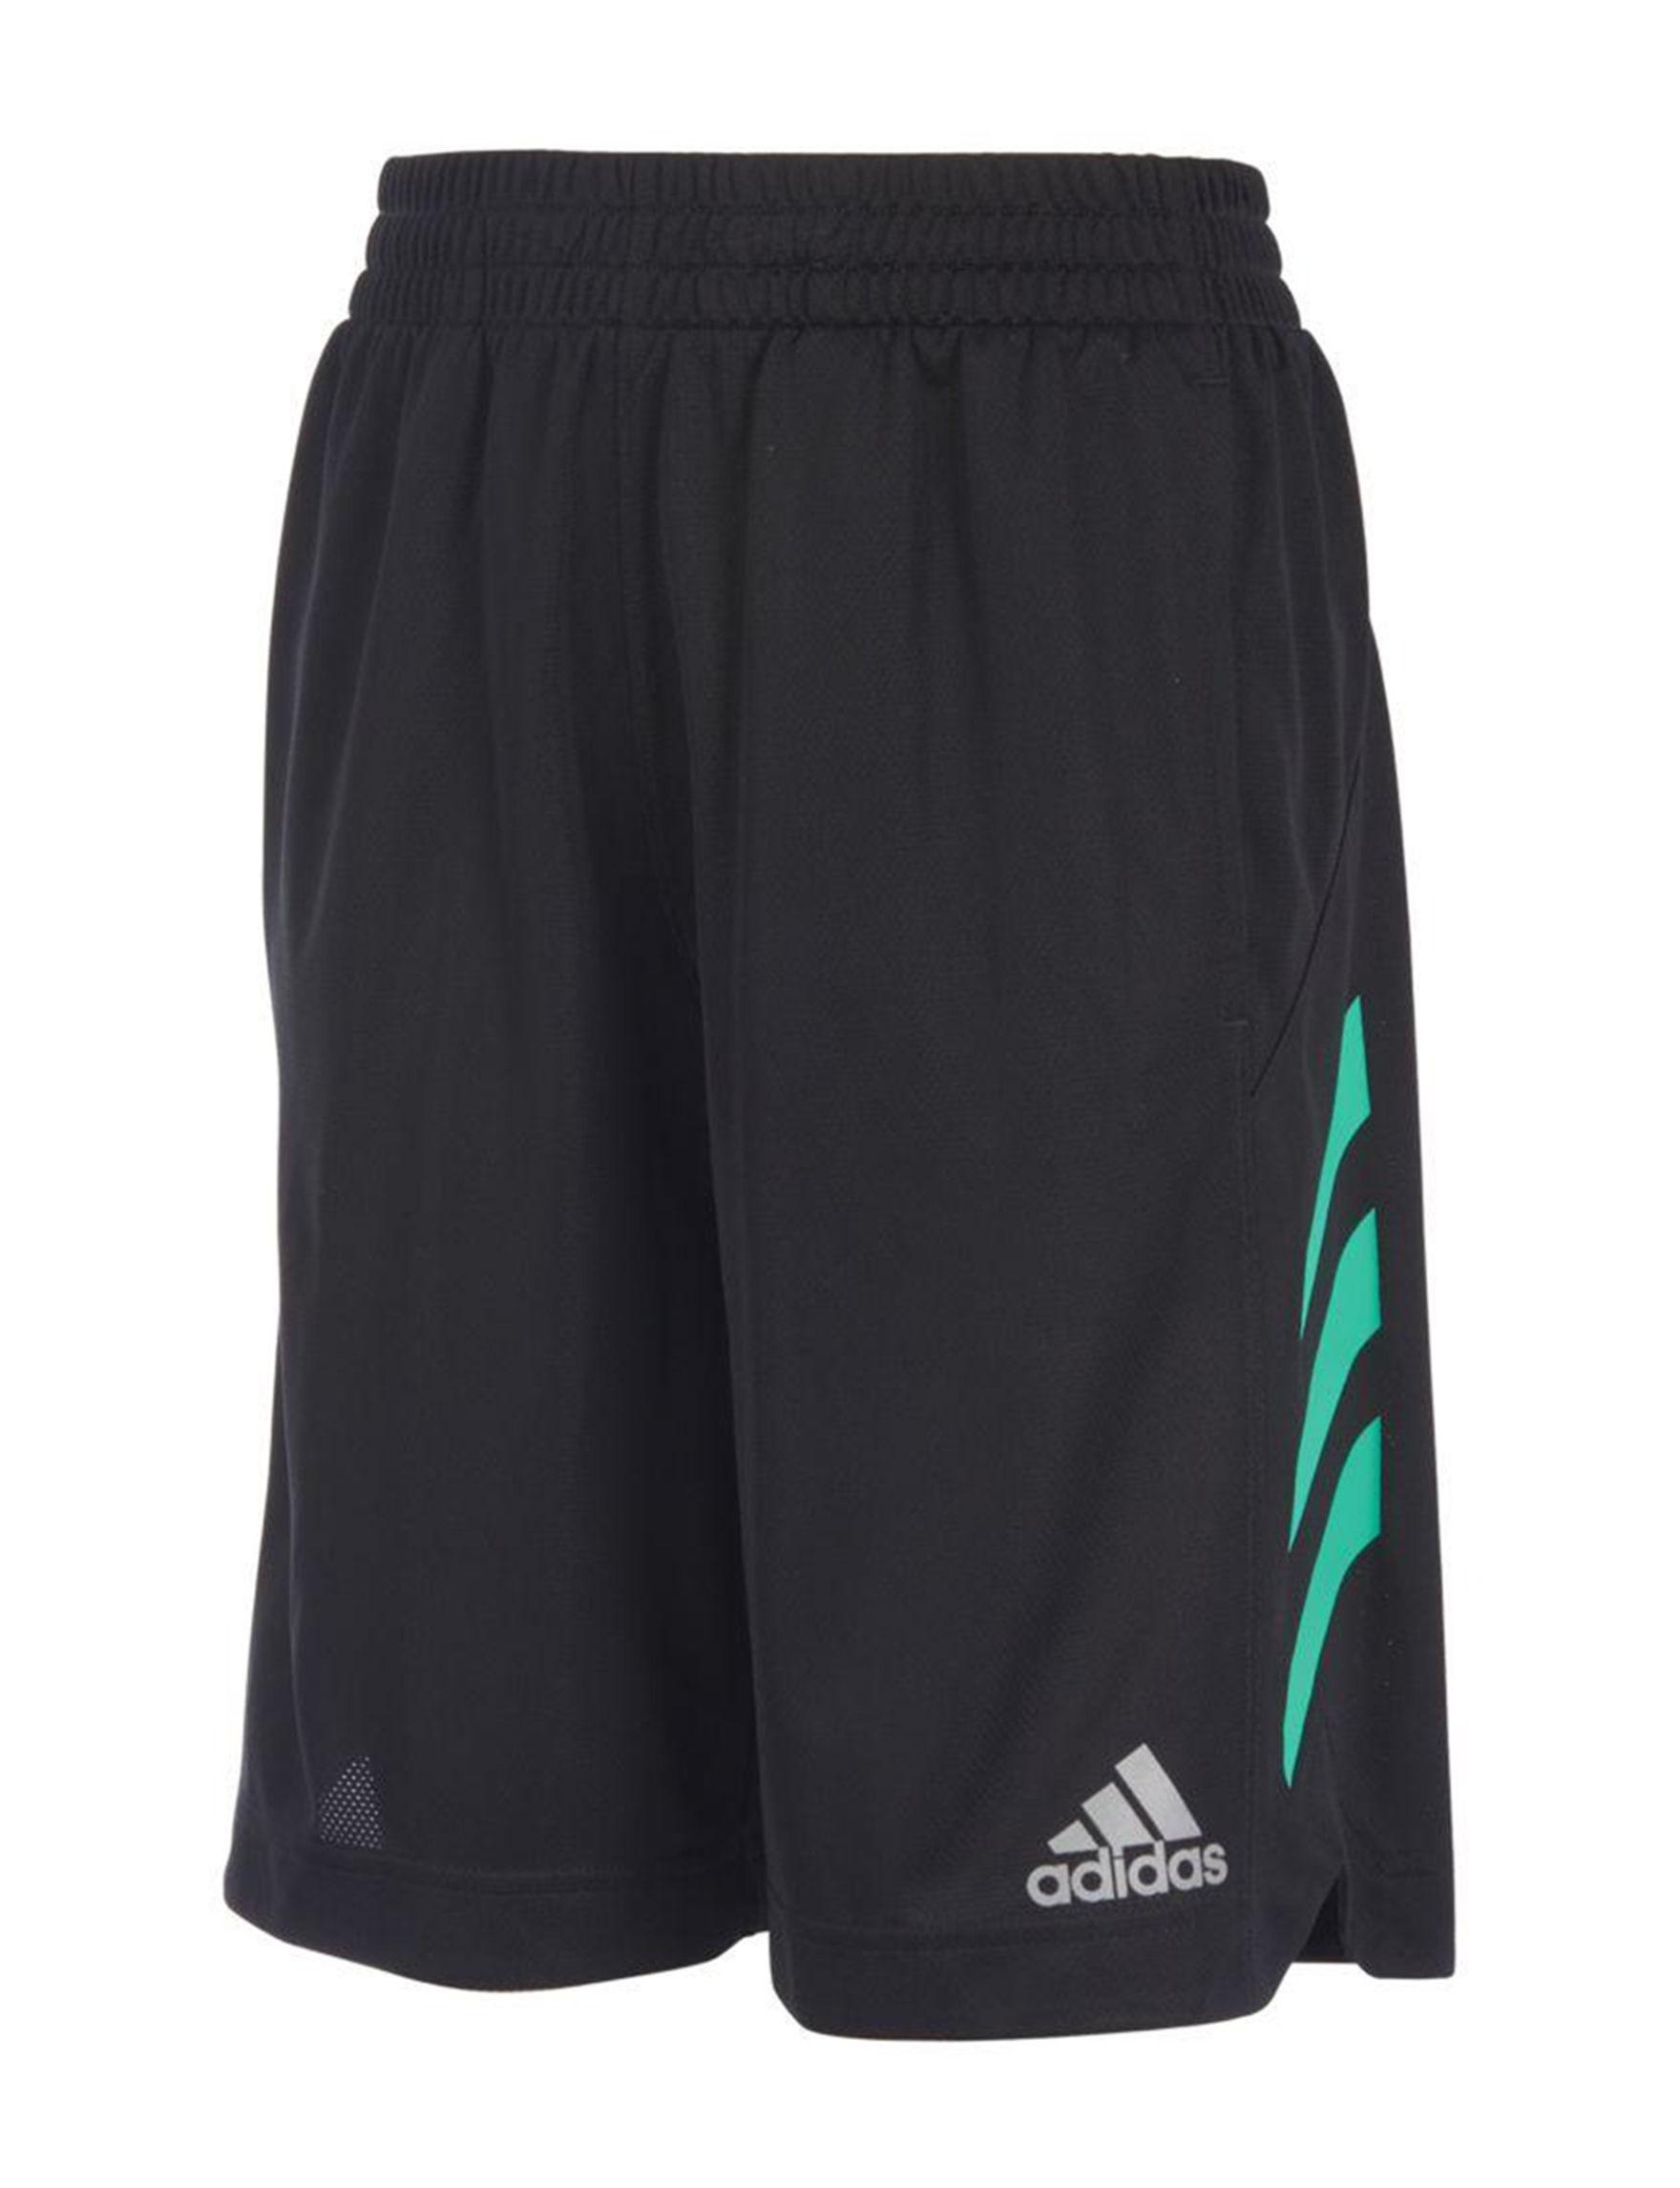 Adidas Black / Green Soft Shorts